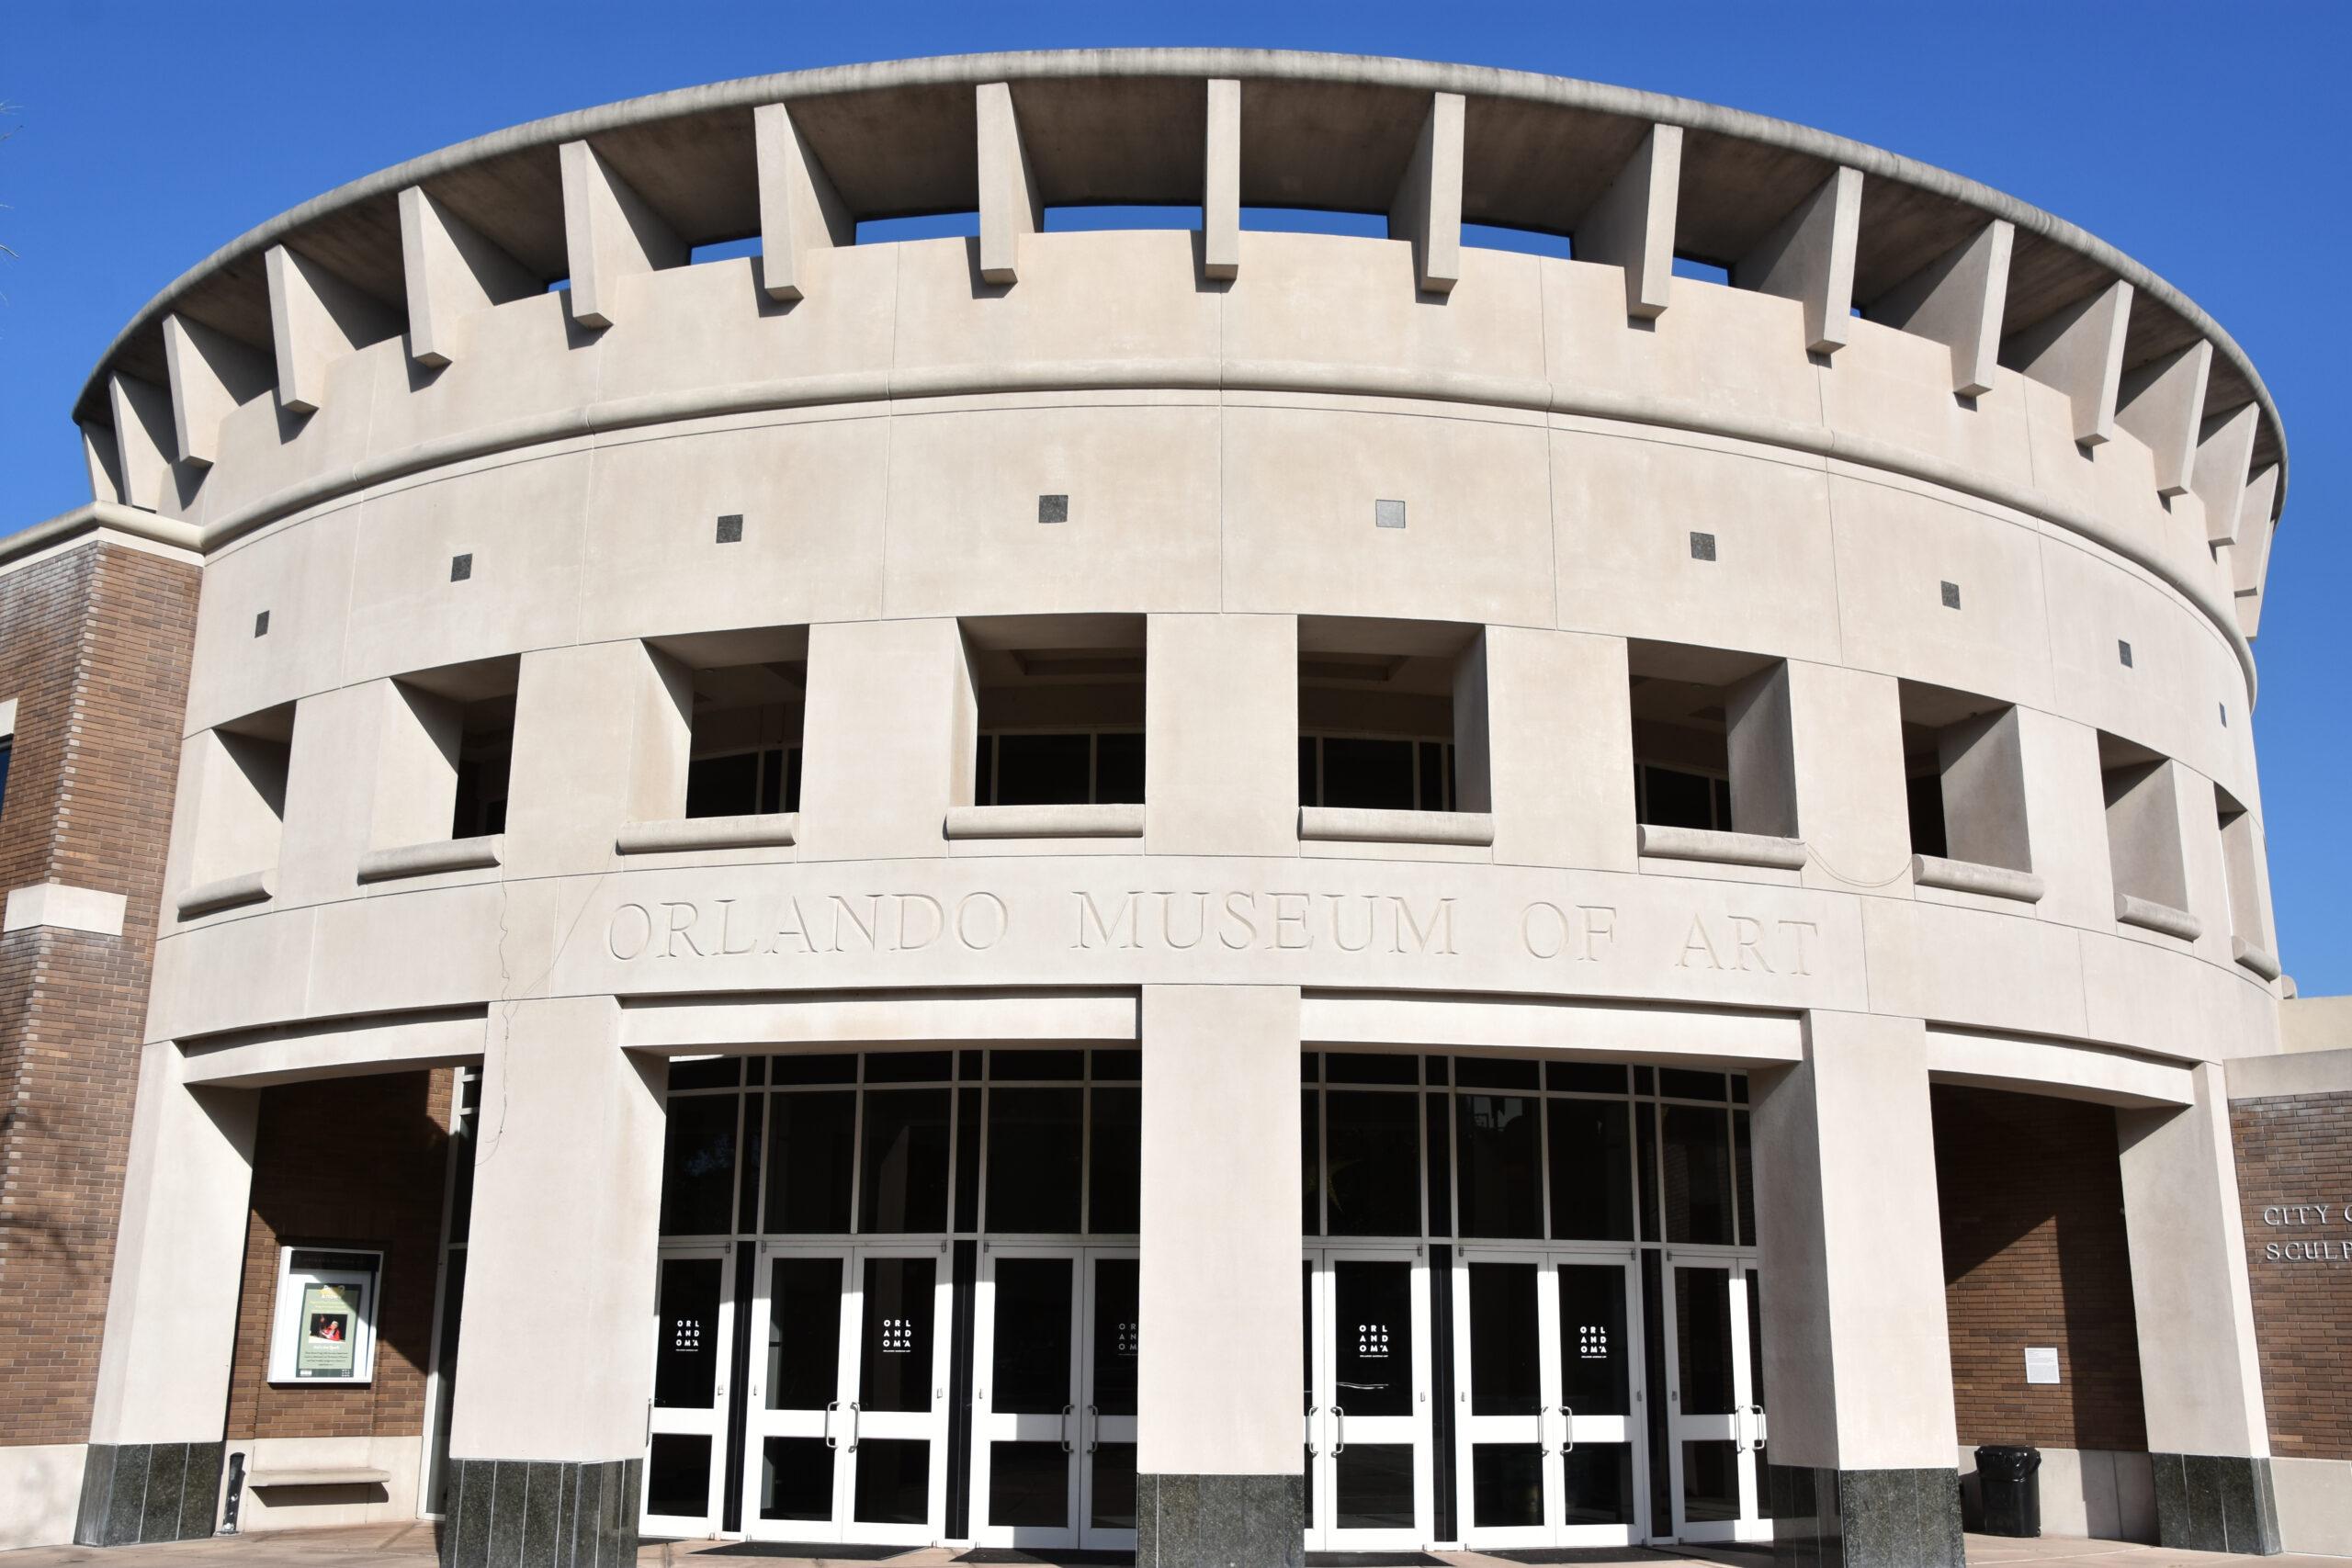 Orlando museum of art scaled